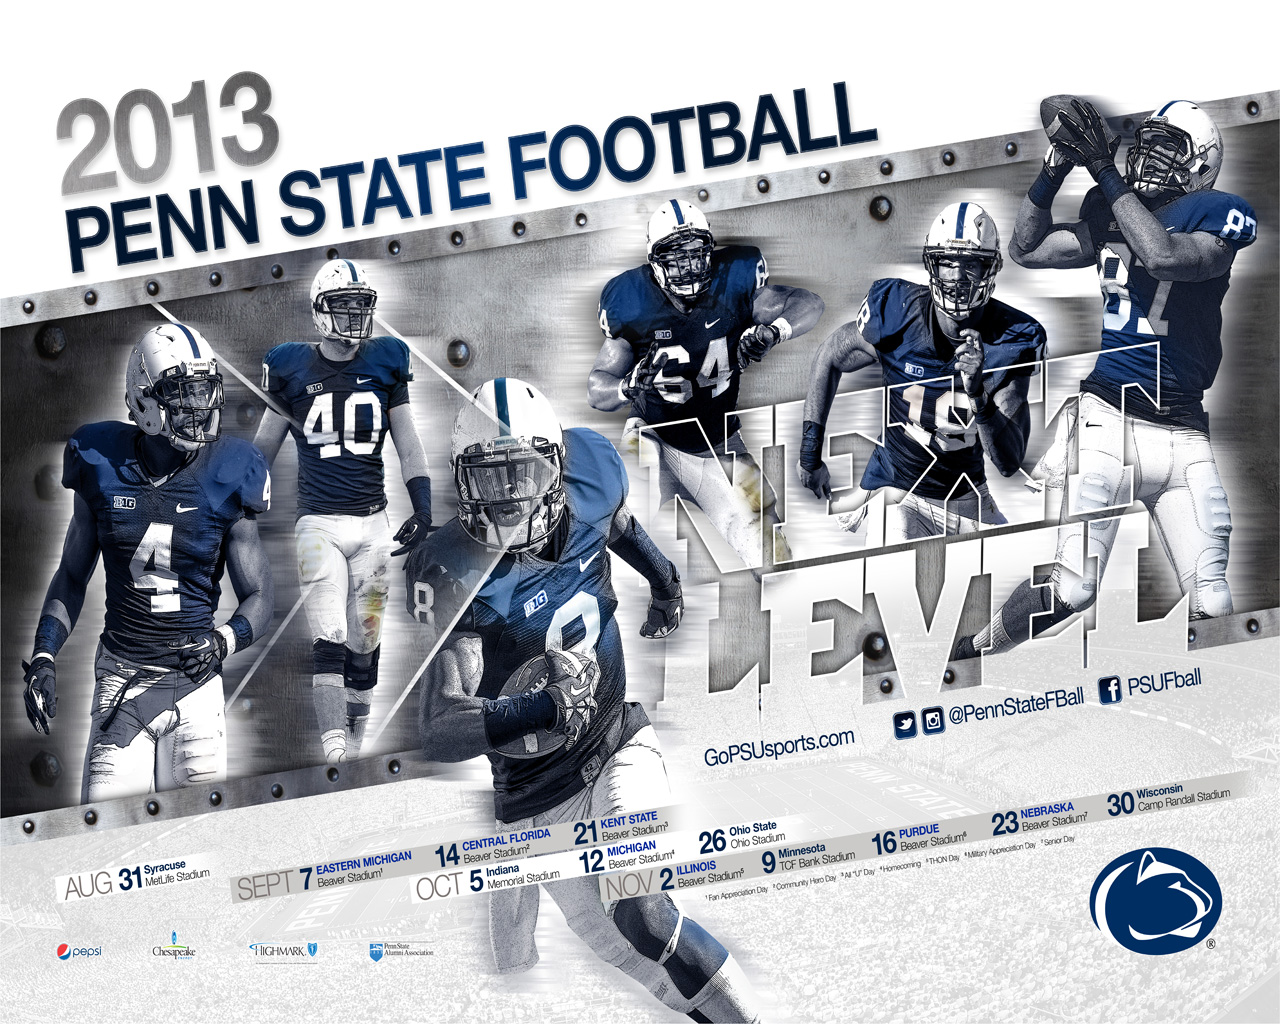 Penn State Football Wallpaper Hd Wallpapers 1280x1024